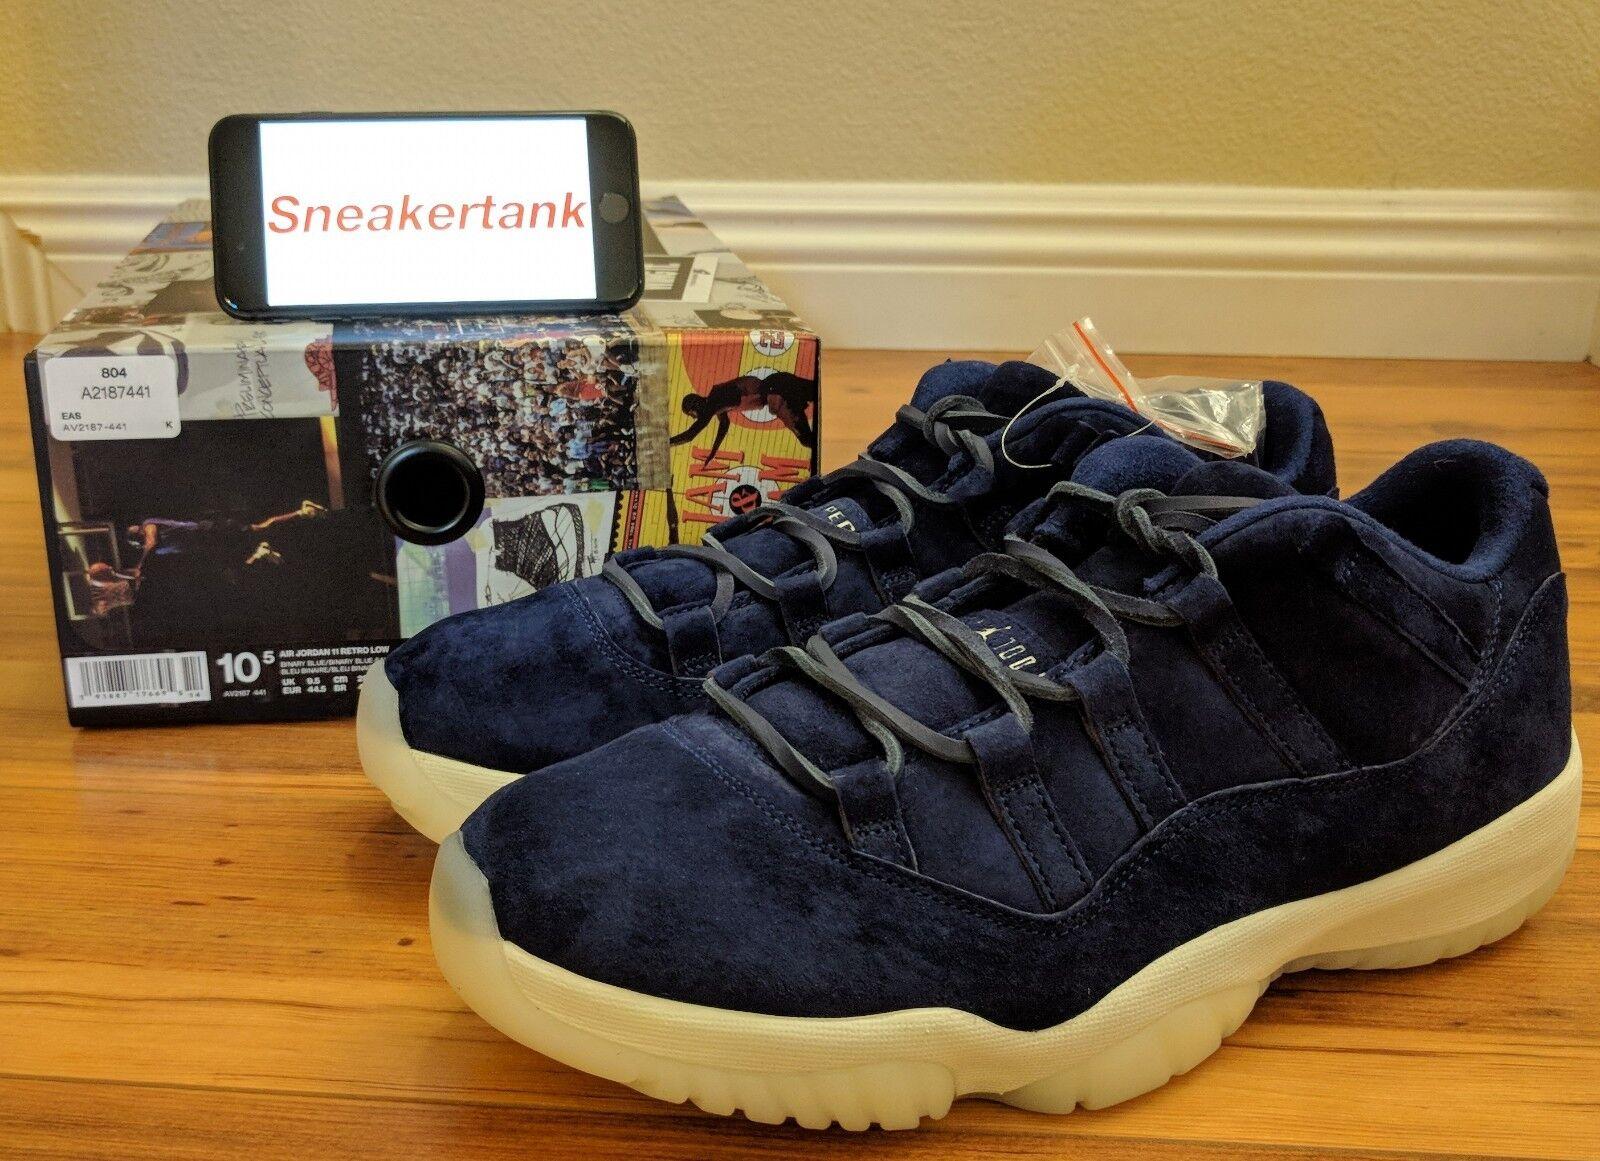 buy online 51017 7e39a DS Nike Air Jordan Jordan Jordan Retro 11 XI Low RE2PECT Derek Jeter Size   10.5